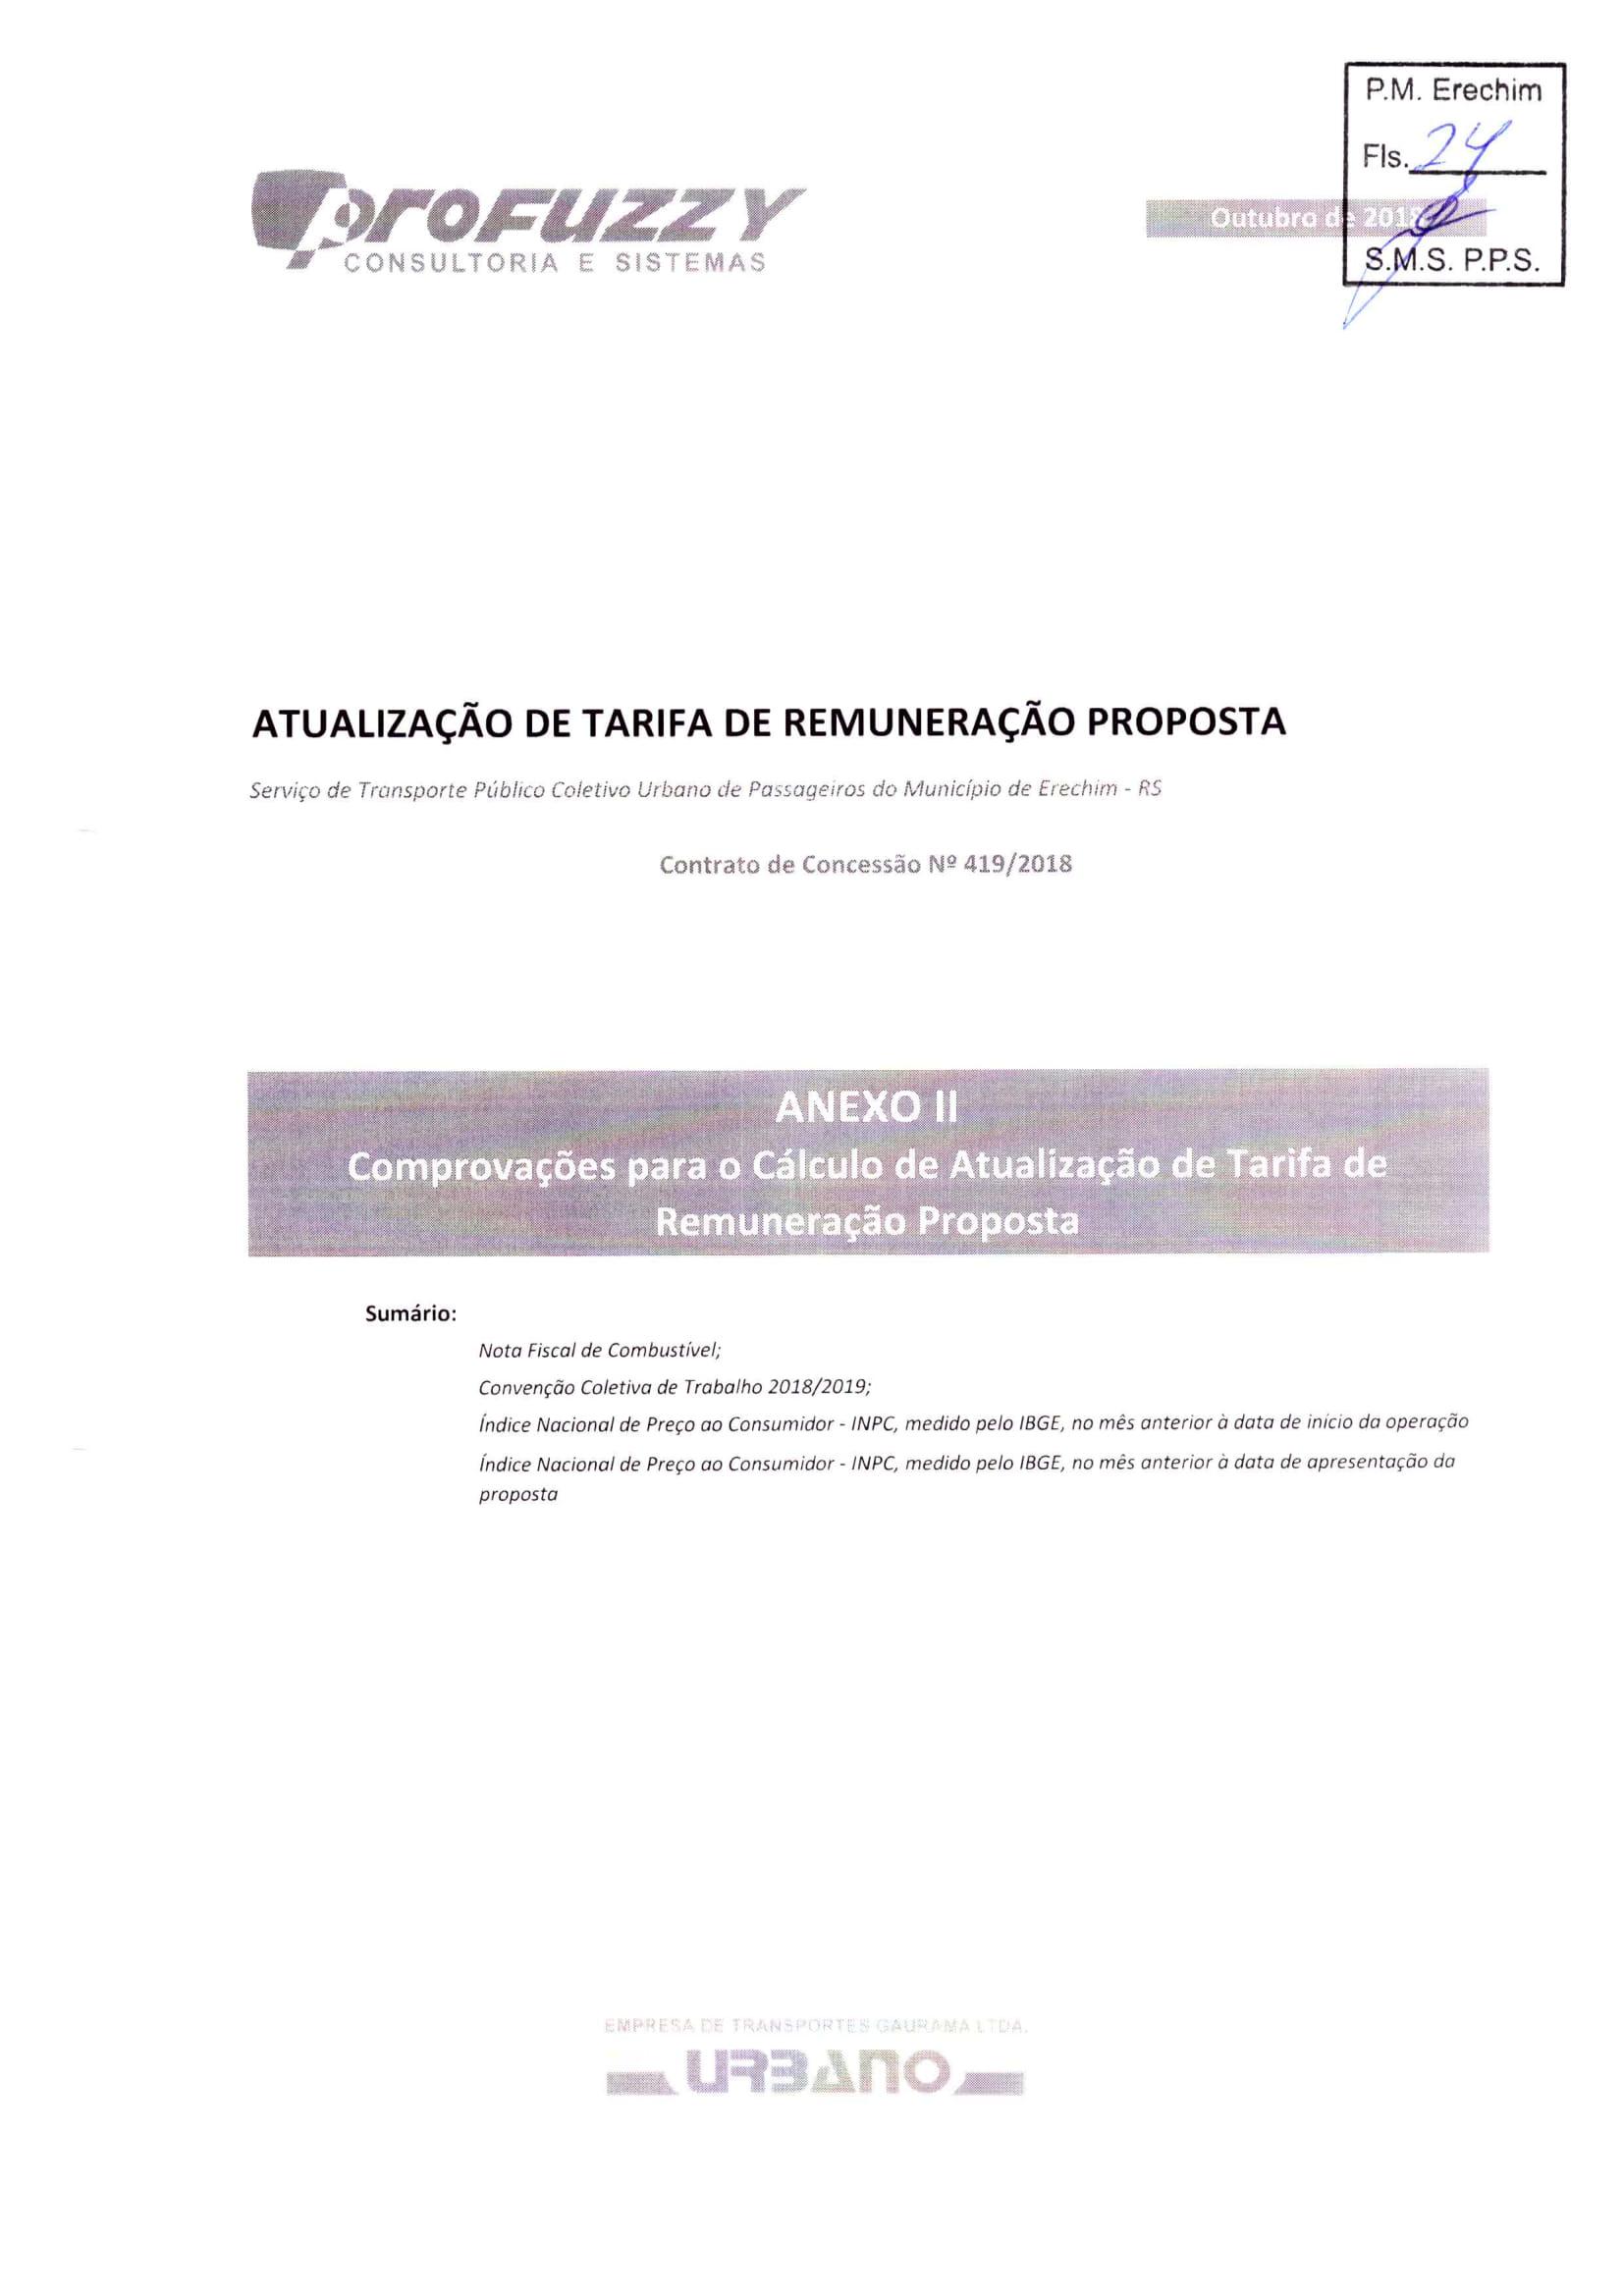 Tarifas - Atualizacao-03